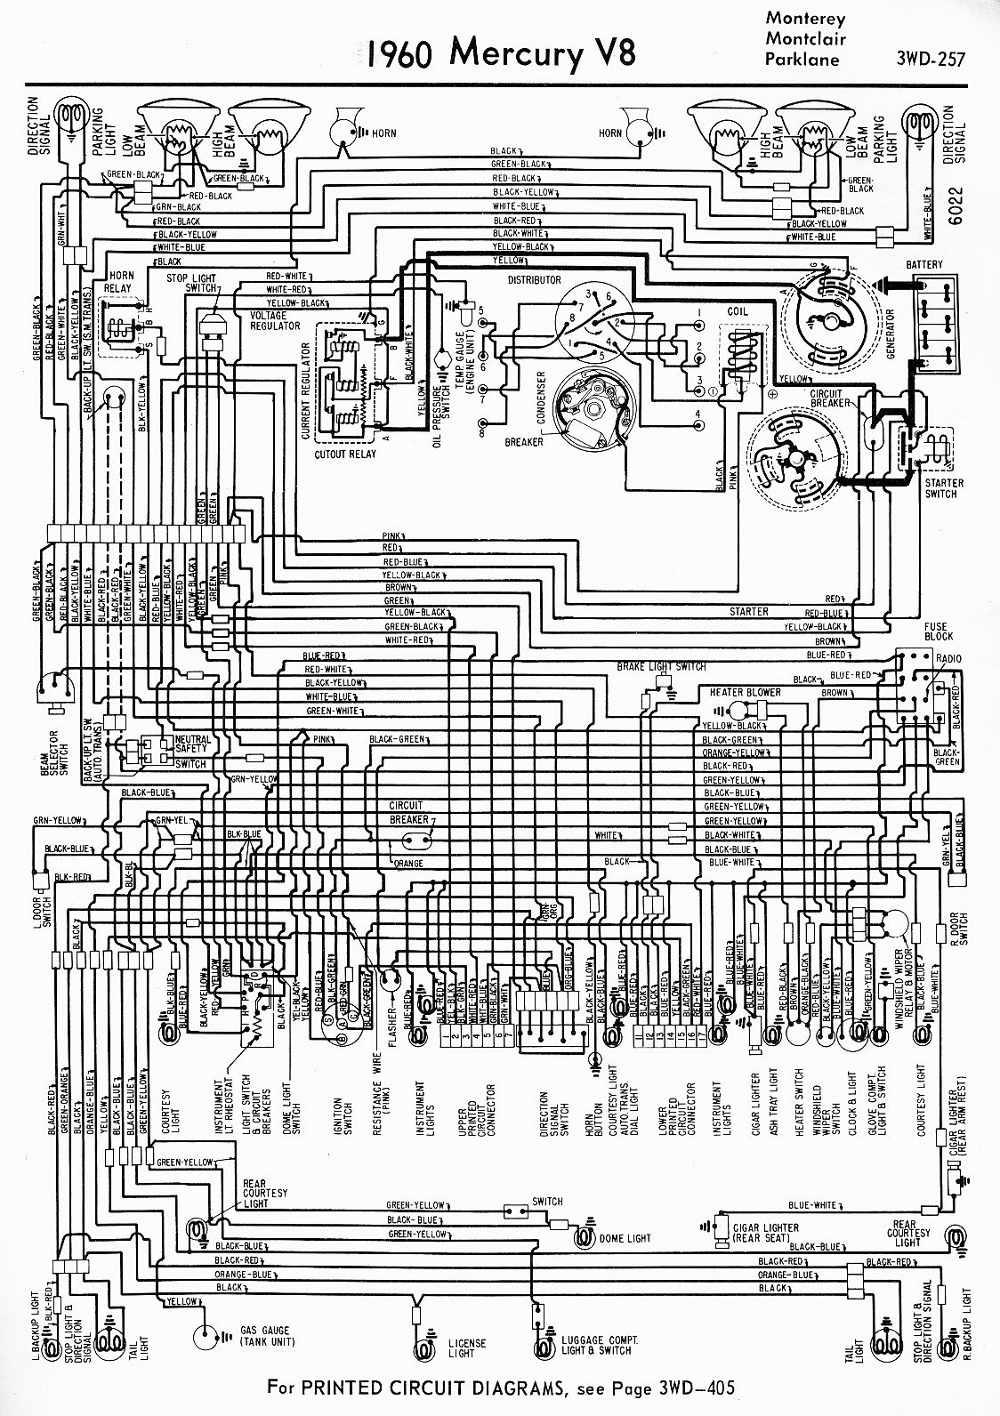 colorful blue bird bus wiring diagrams photo electrical diagram rh piotomar info bluebird school bus wiring diagrams 1999 bluebird bus wiring diagram